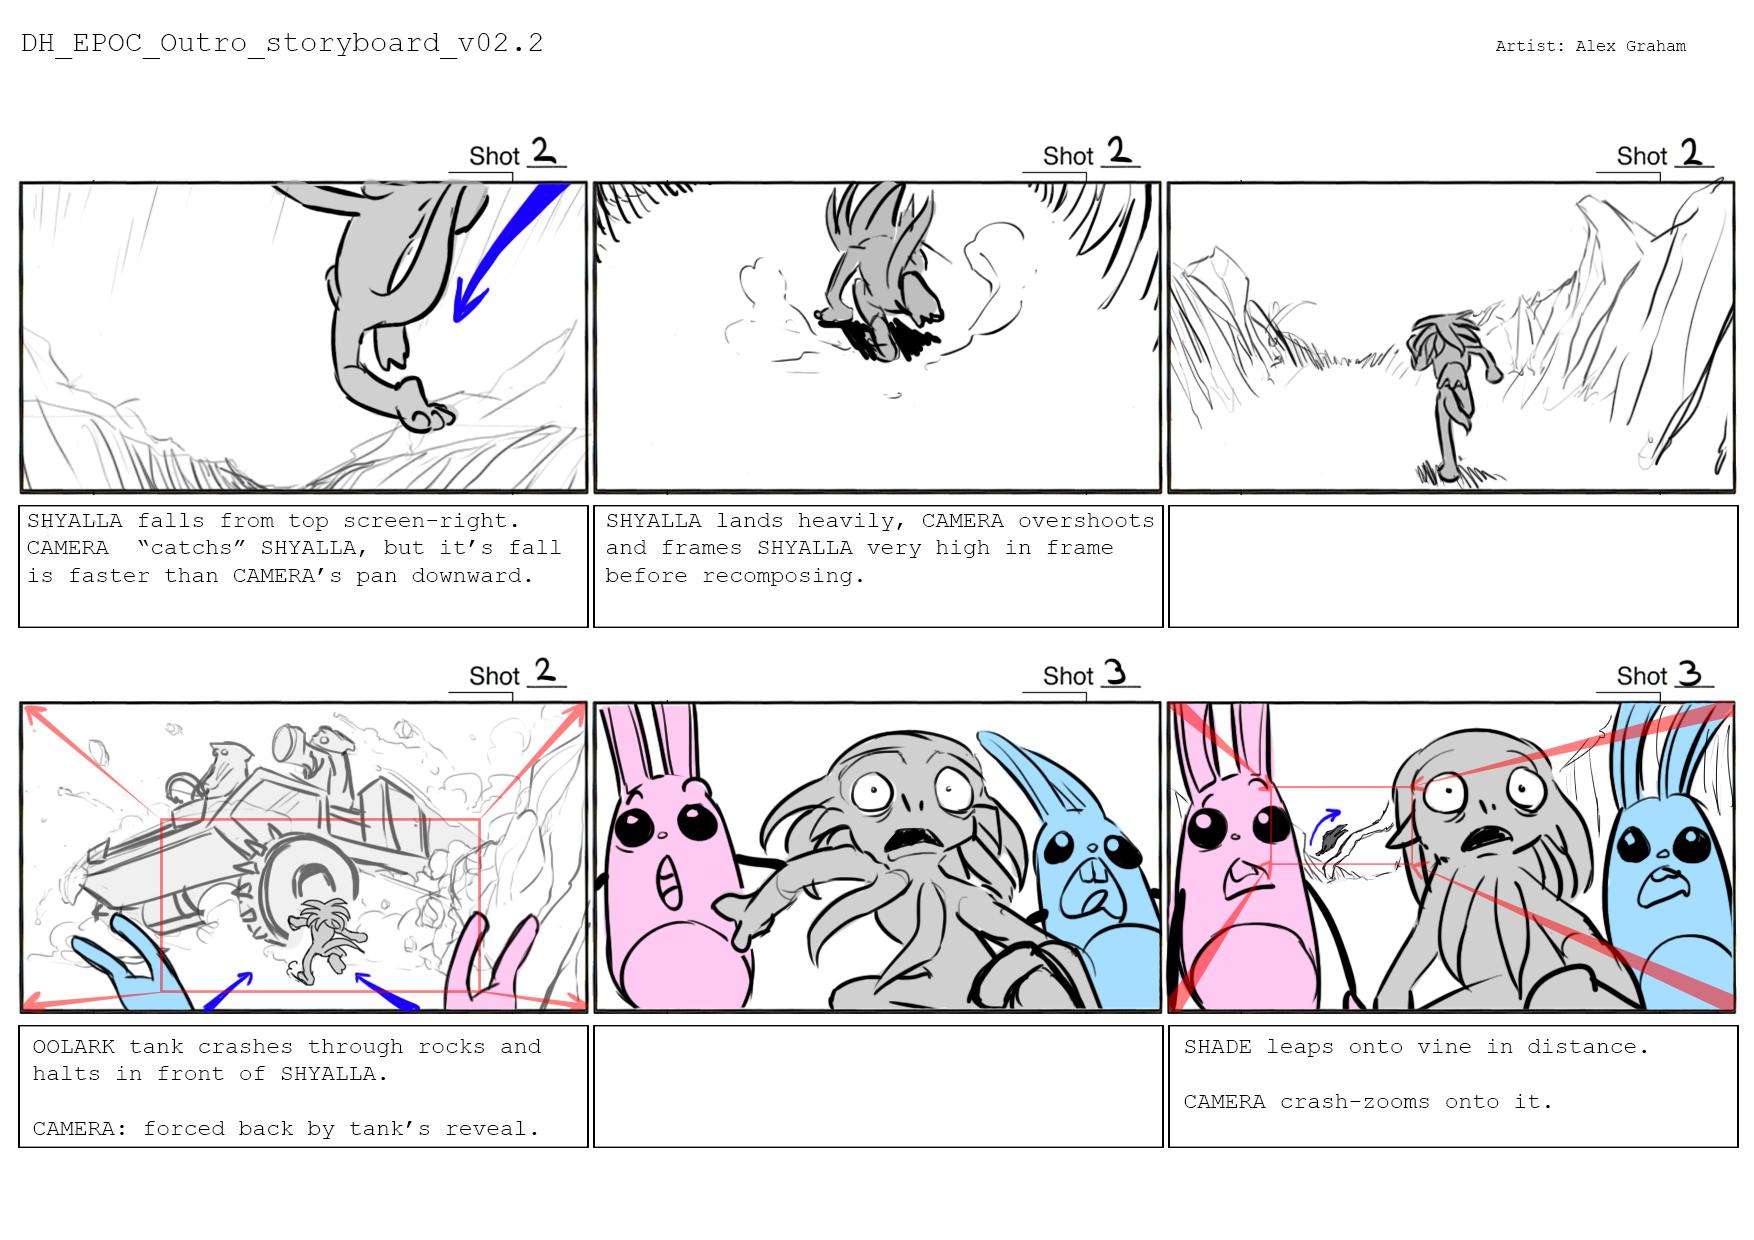 ABG_storyboard_10